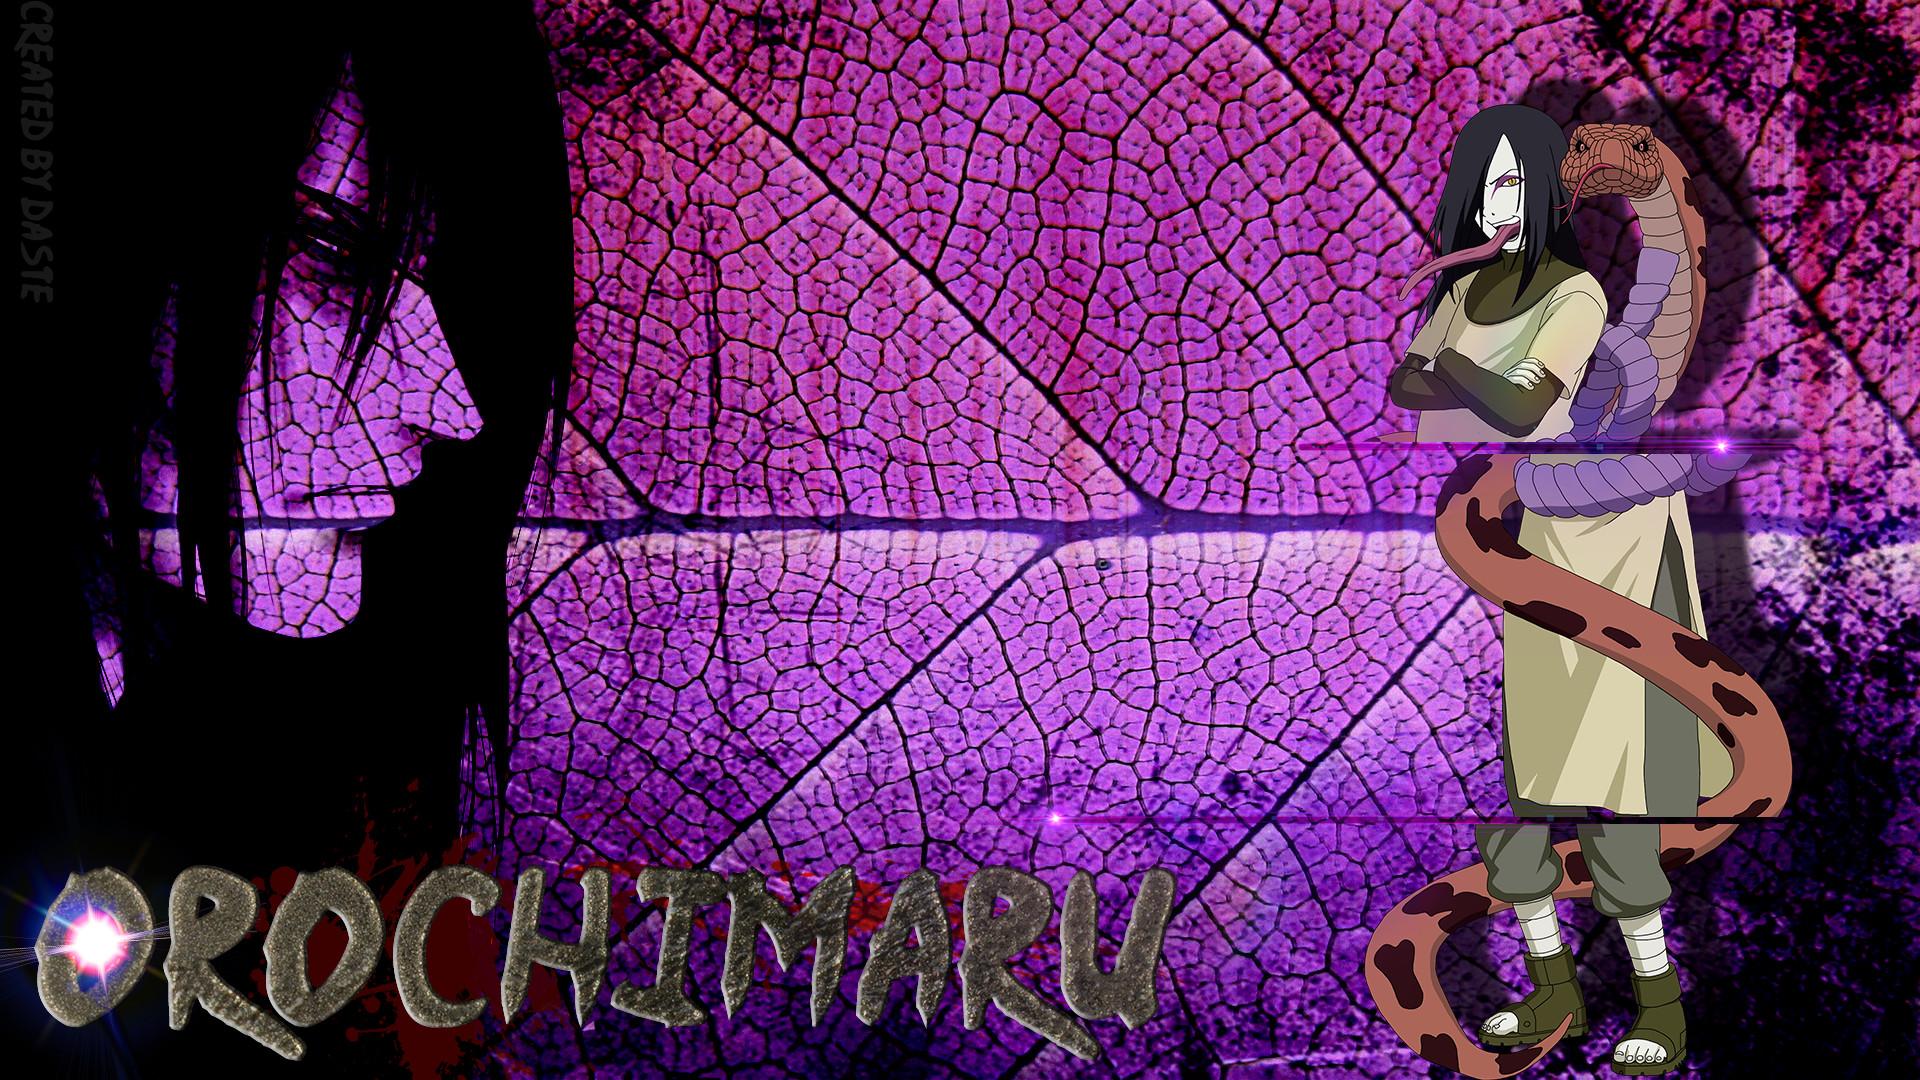 Res: 1920x1080, Orochimaru Wallpaper by DaSte2016 Orochimaru Wallpaper by DaSte2016